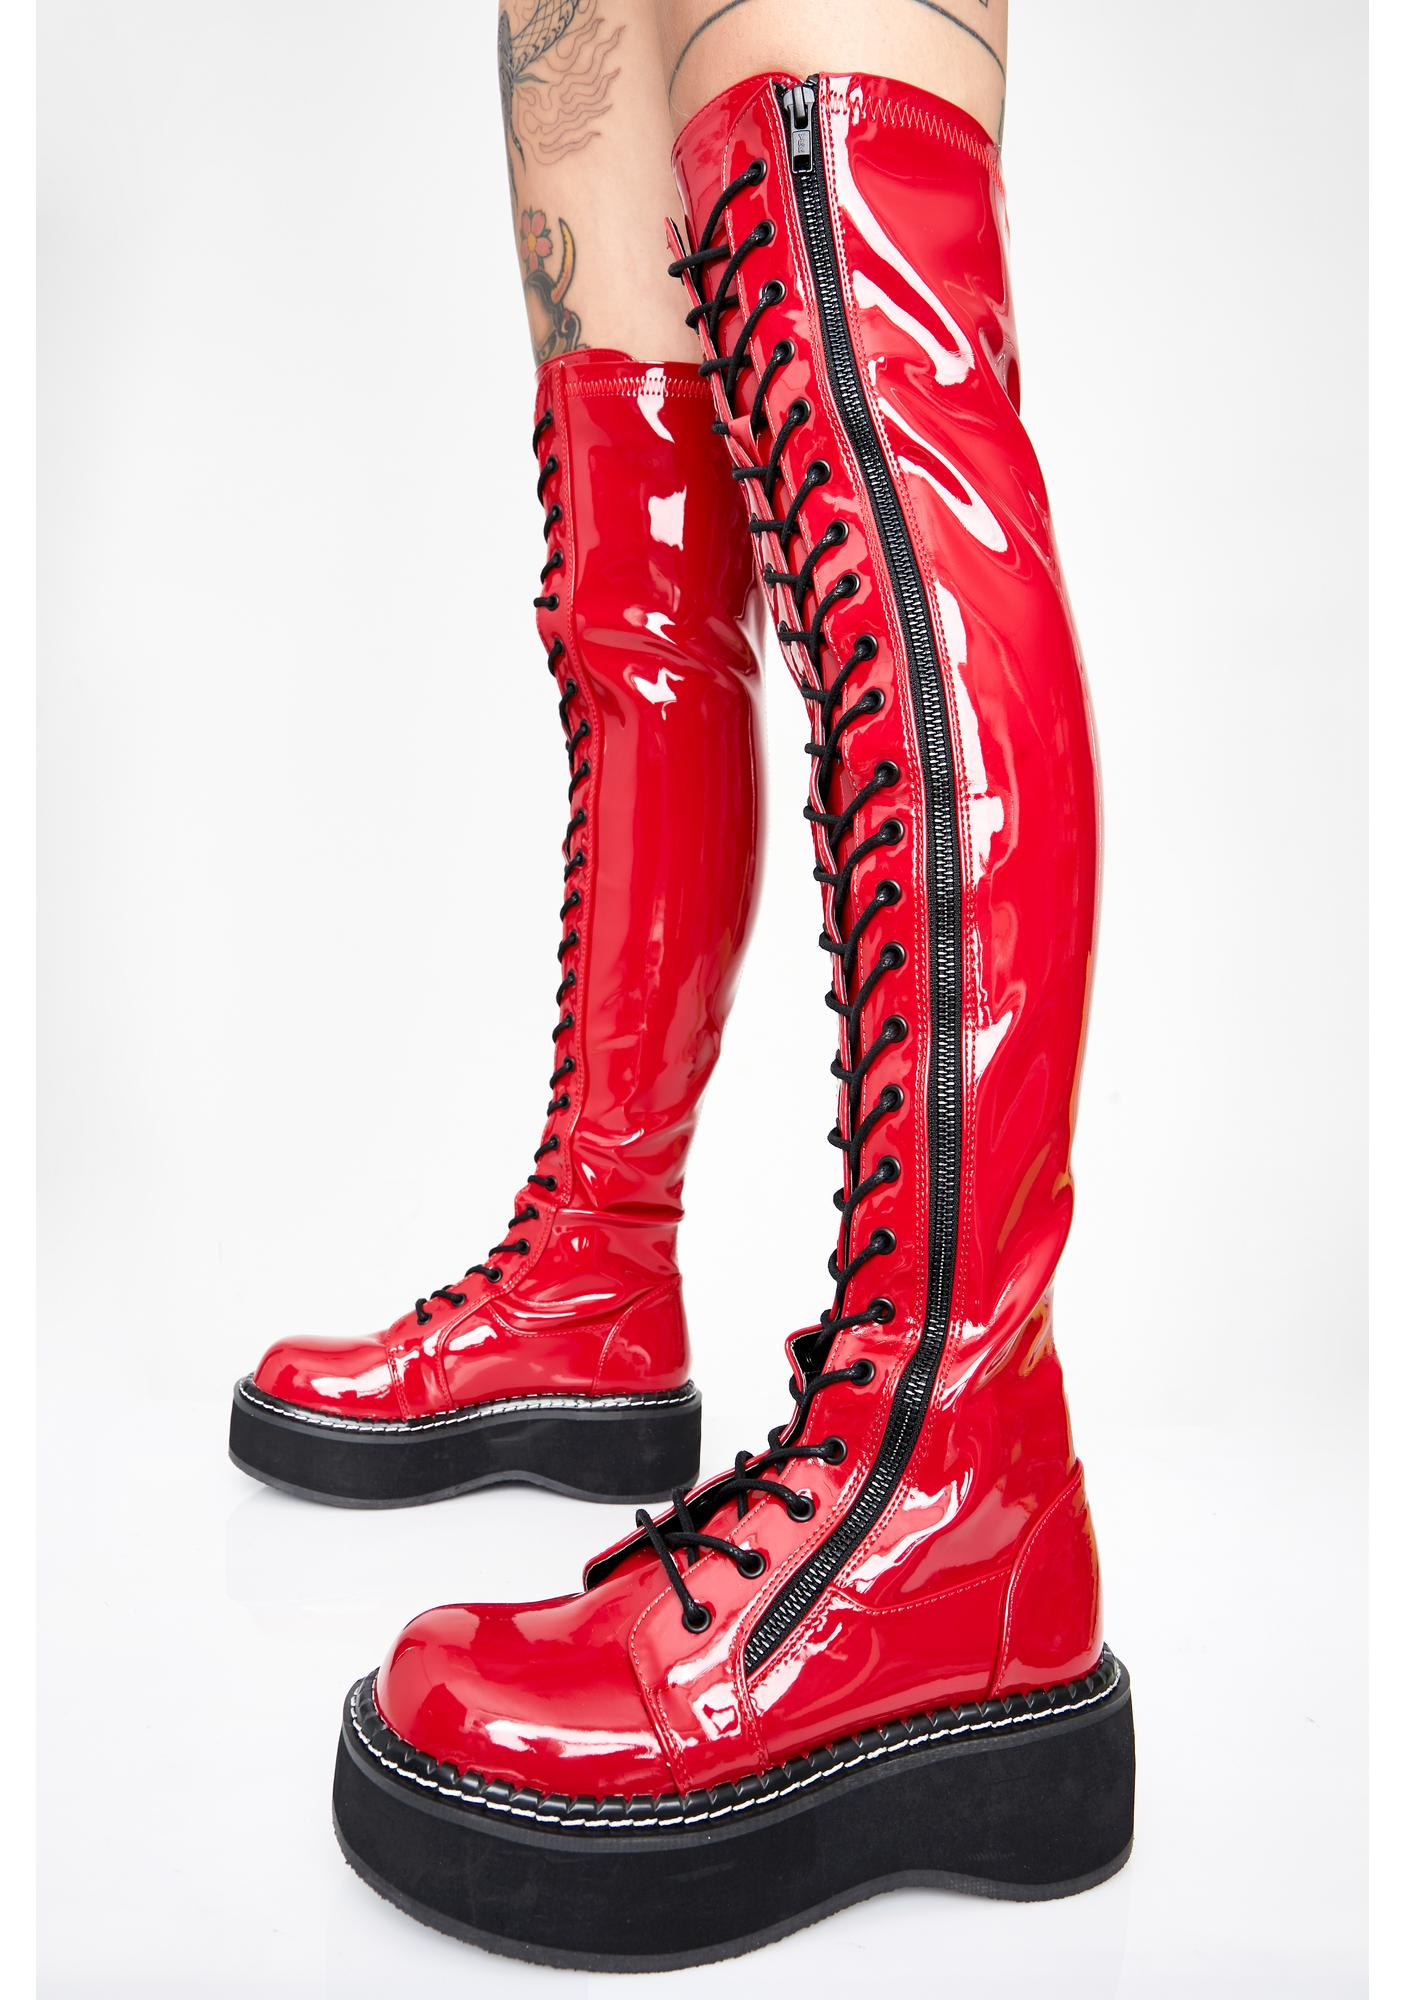 Demonia Cherry Grand Stand Knee High Boots